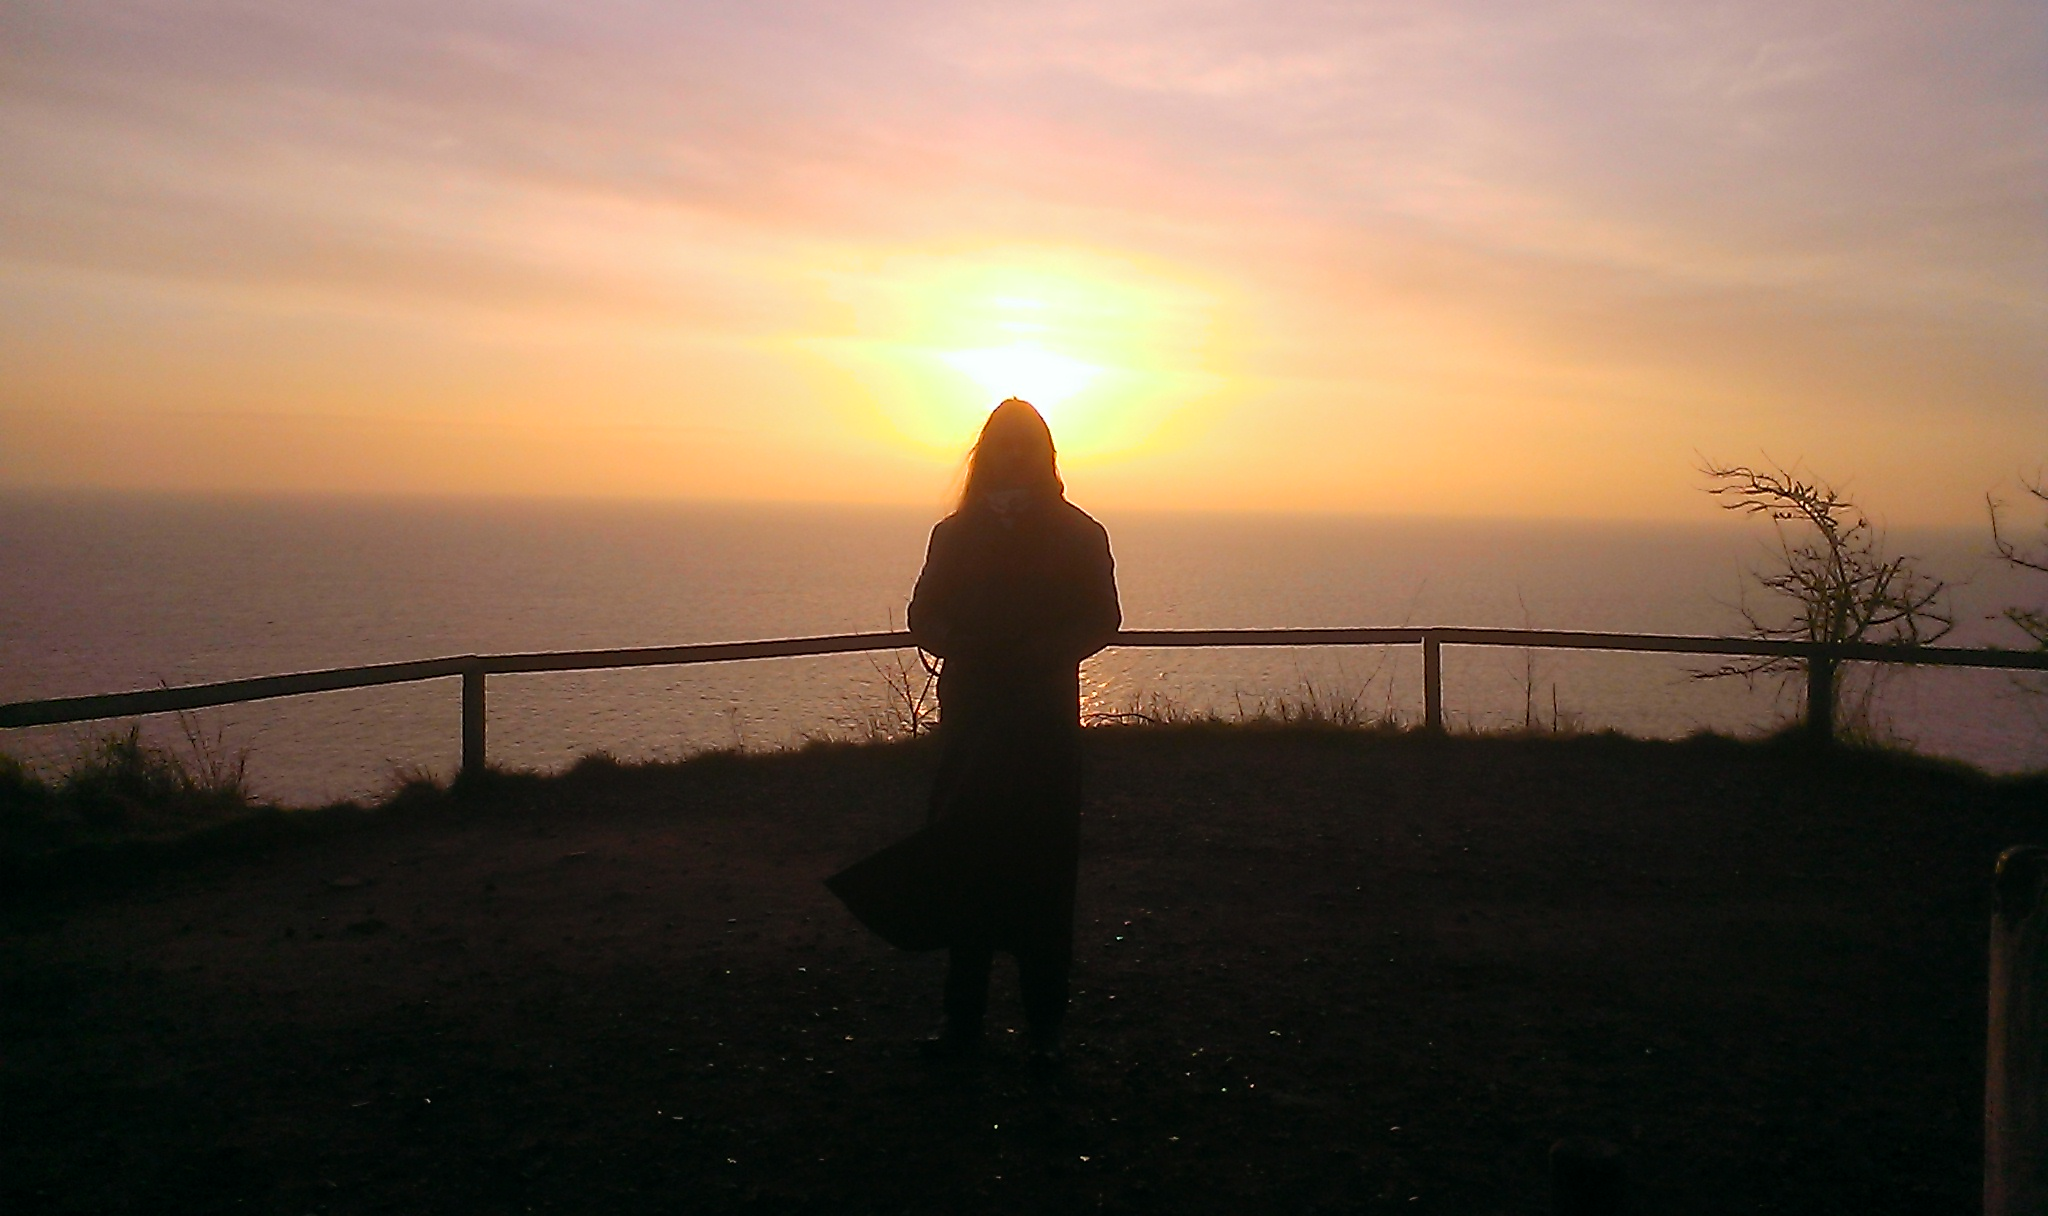 Sonnenaufgang auf Rügen Aussichtspunkt bei Vitt